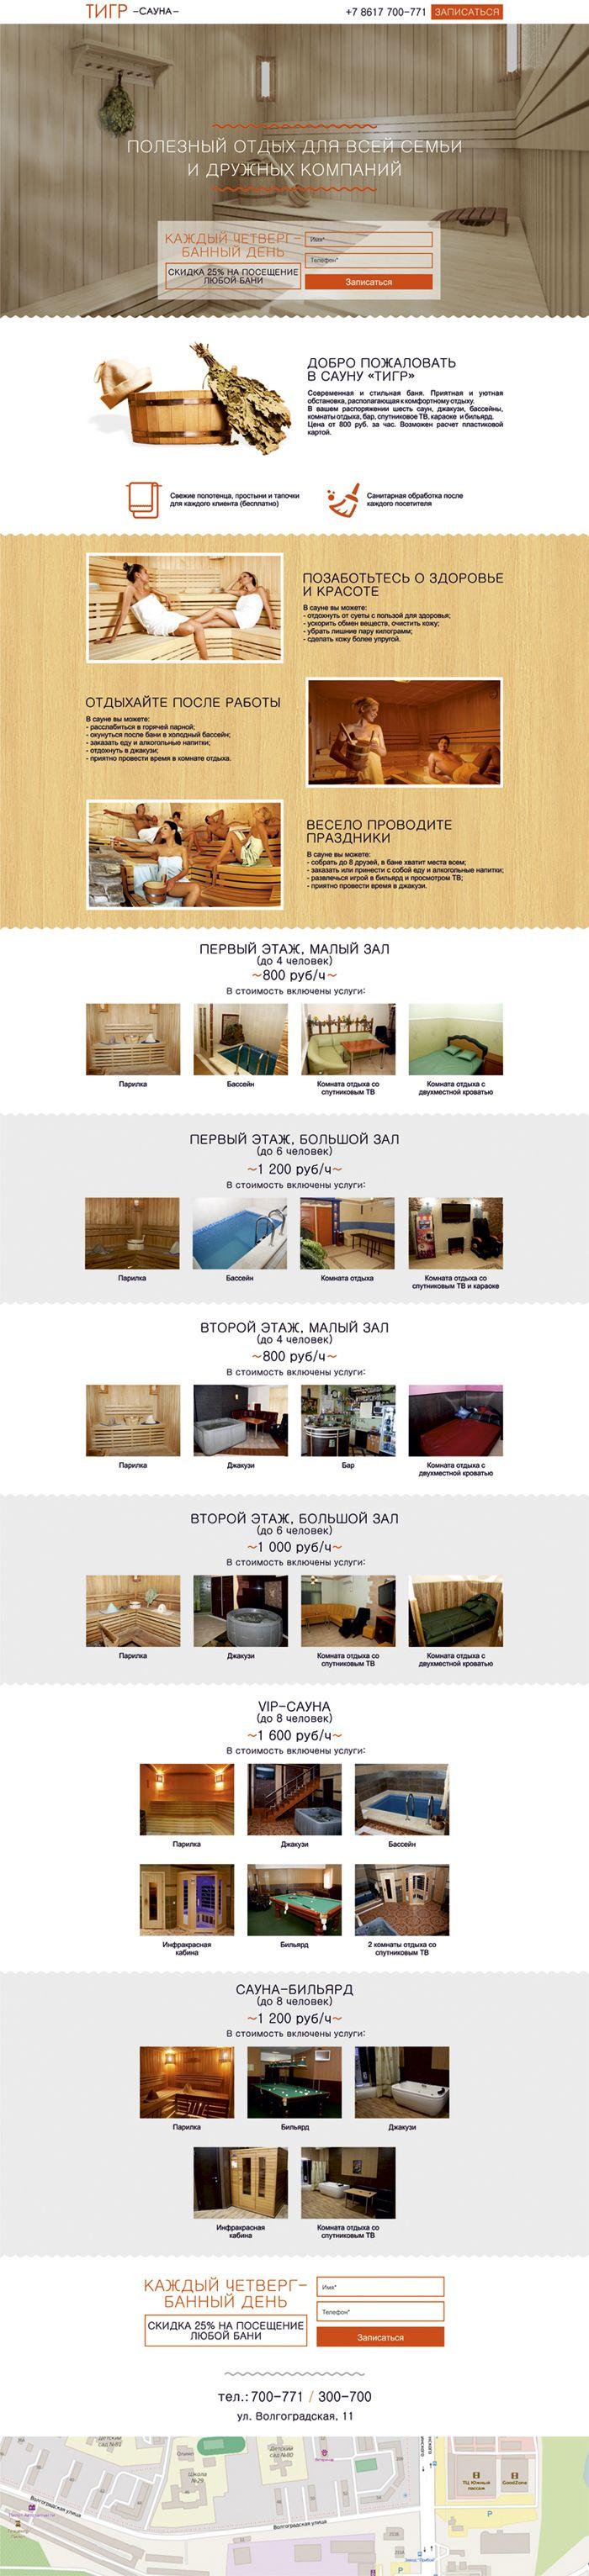 Landing page for sauna. Разработка landing page для сауны.